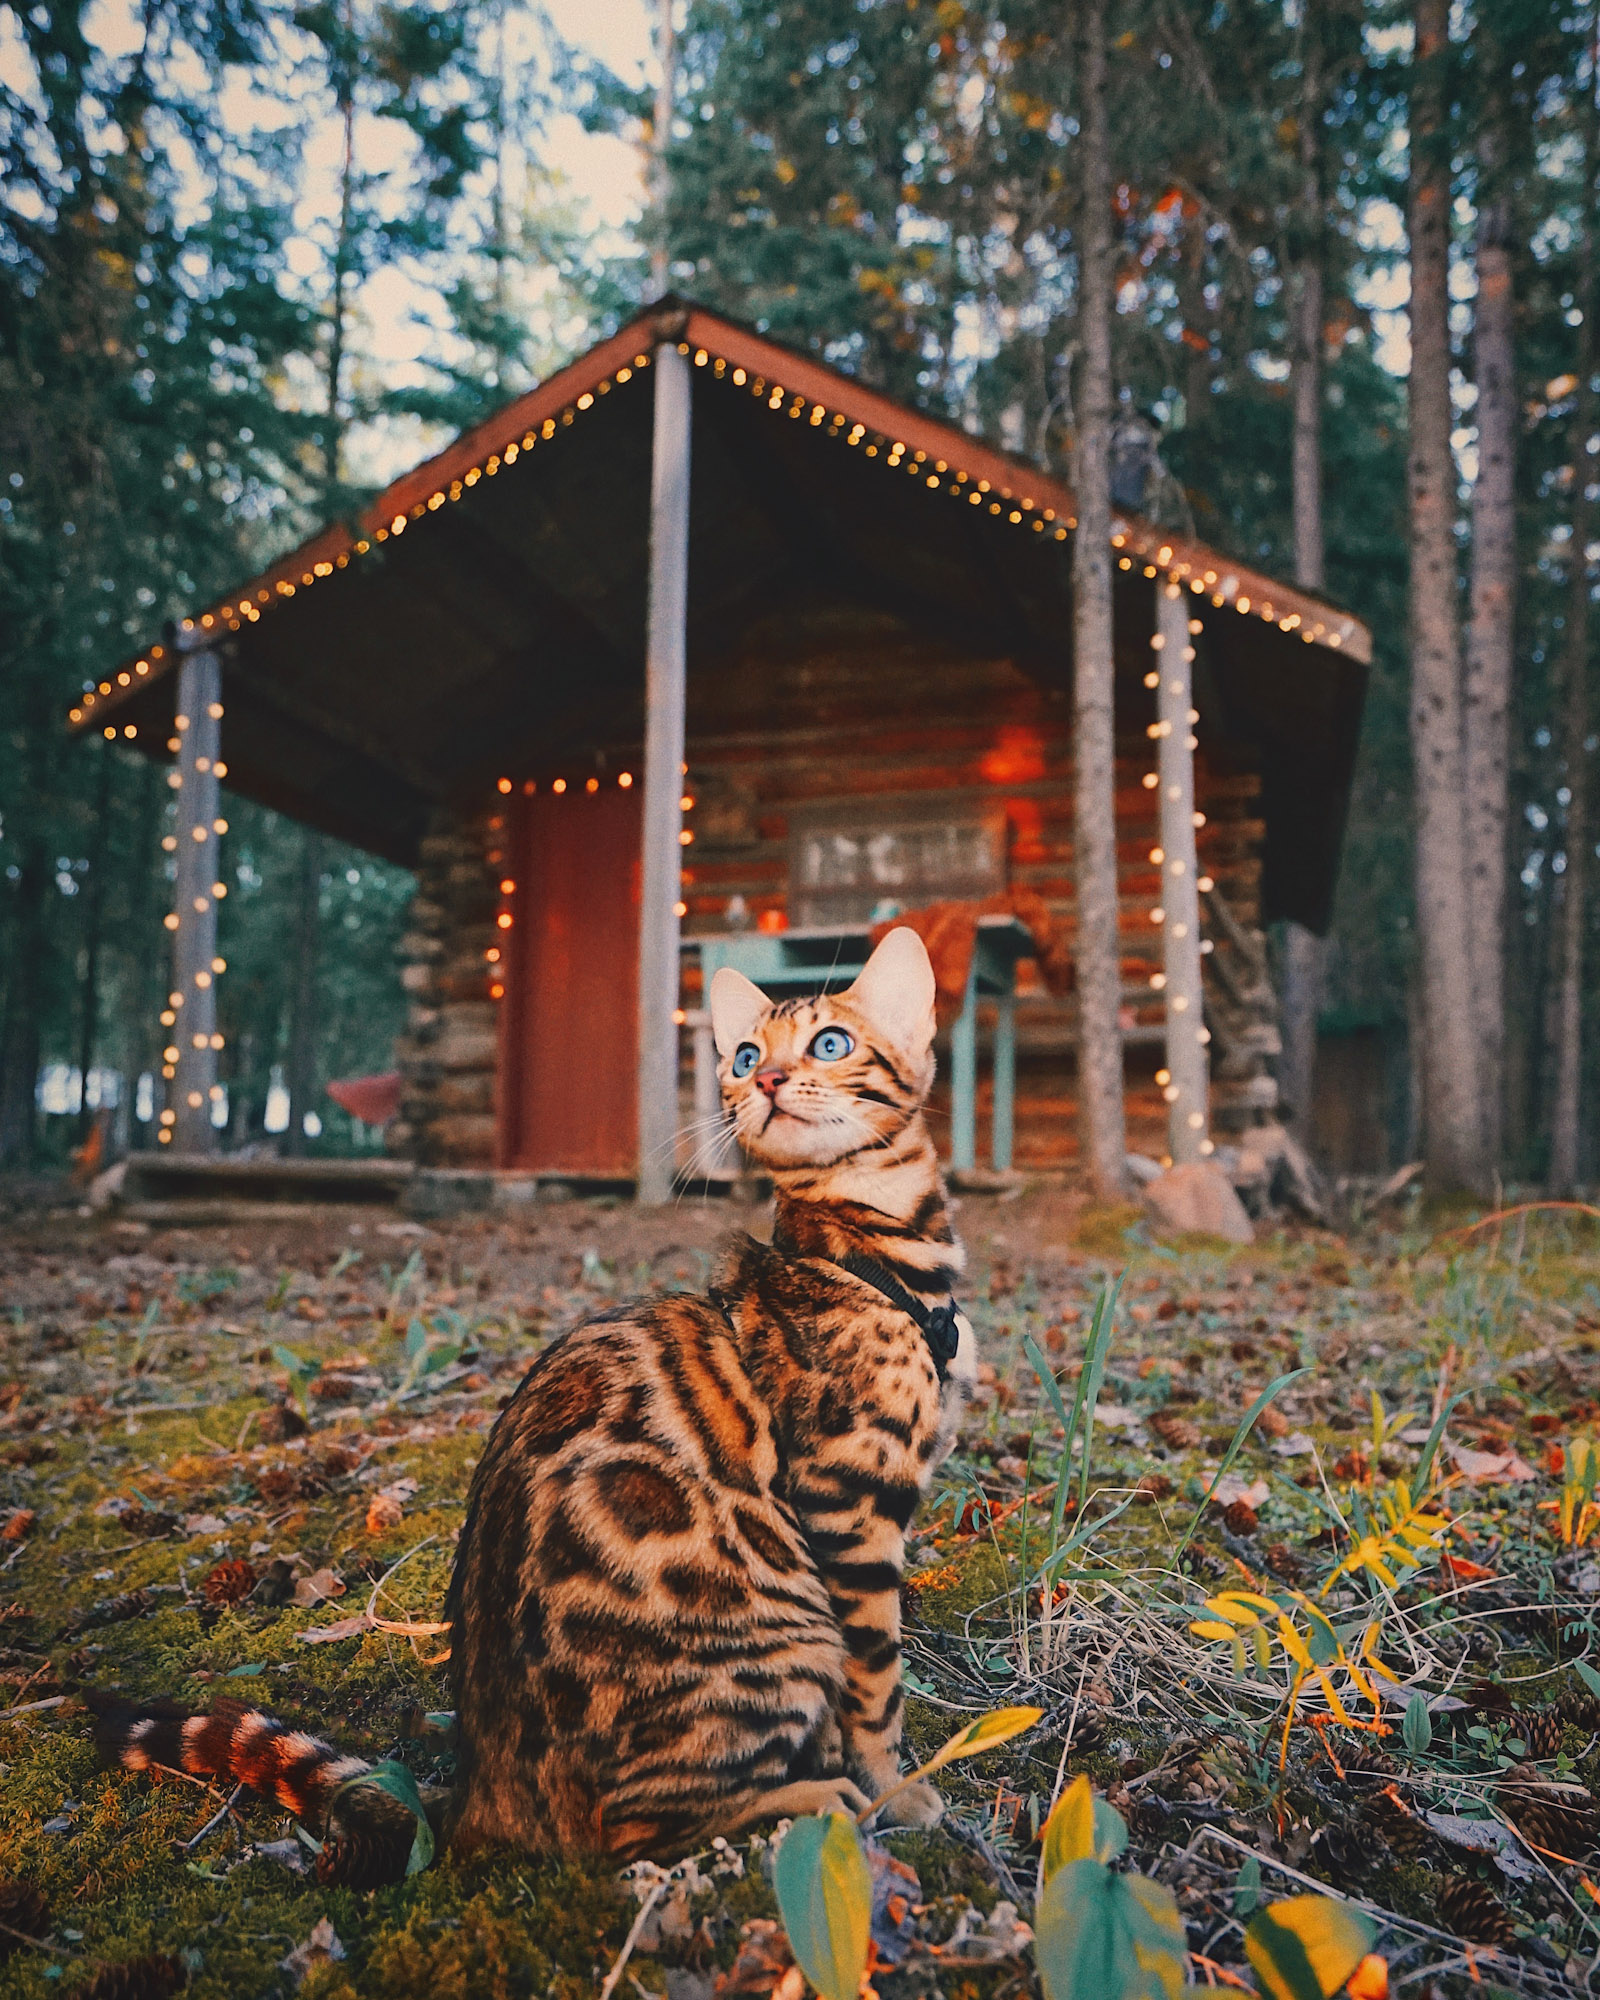 Suki adventure cat in front of cabin